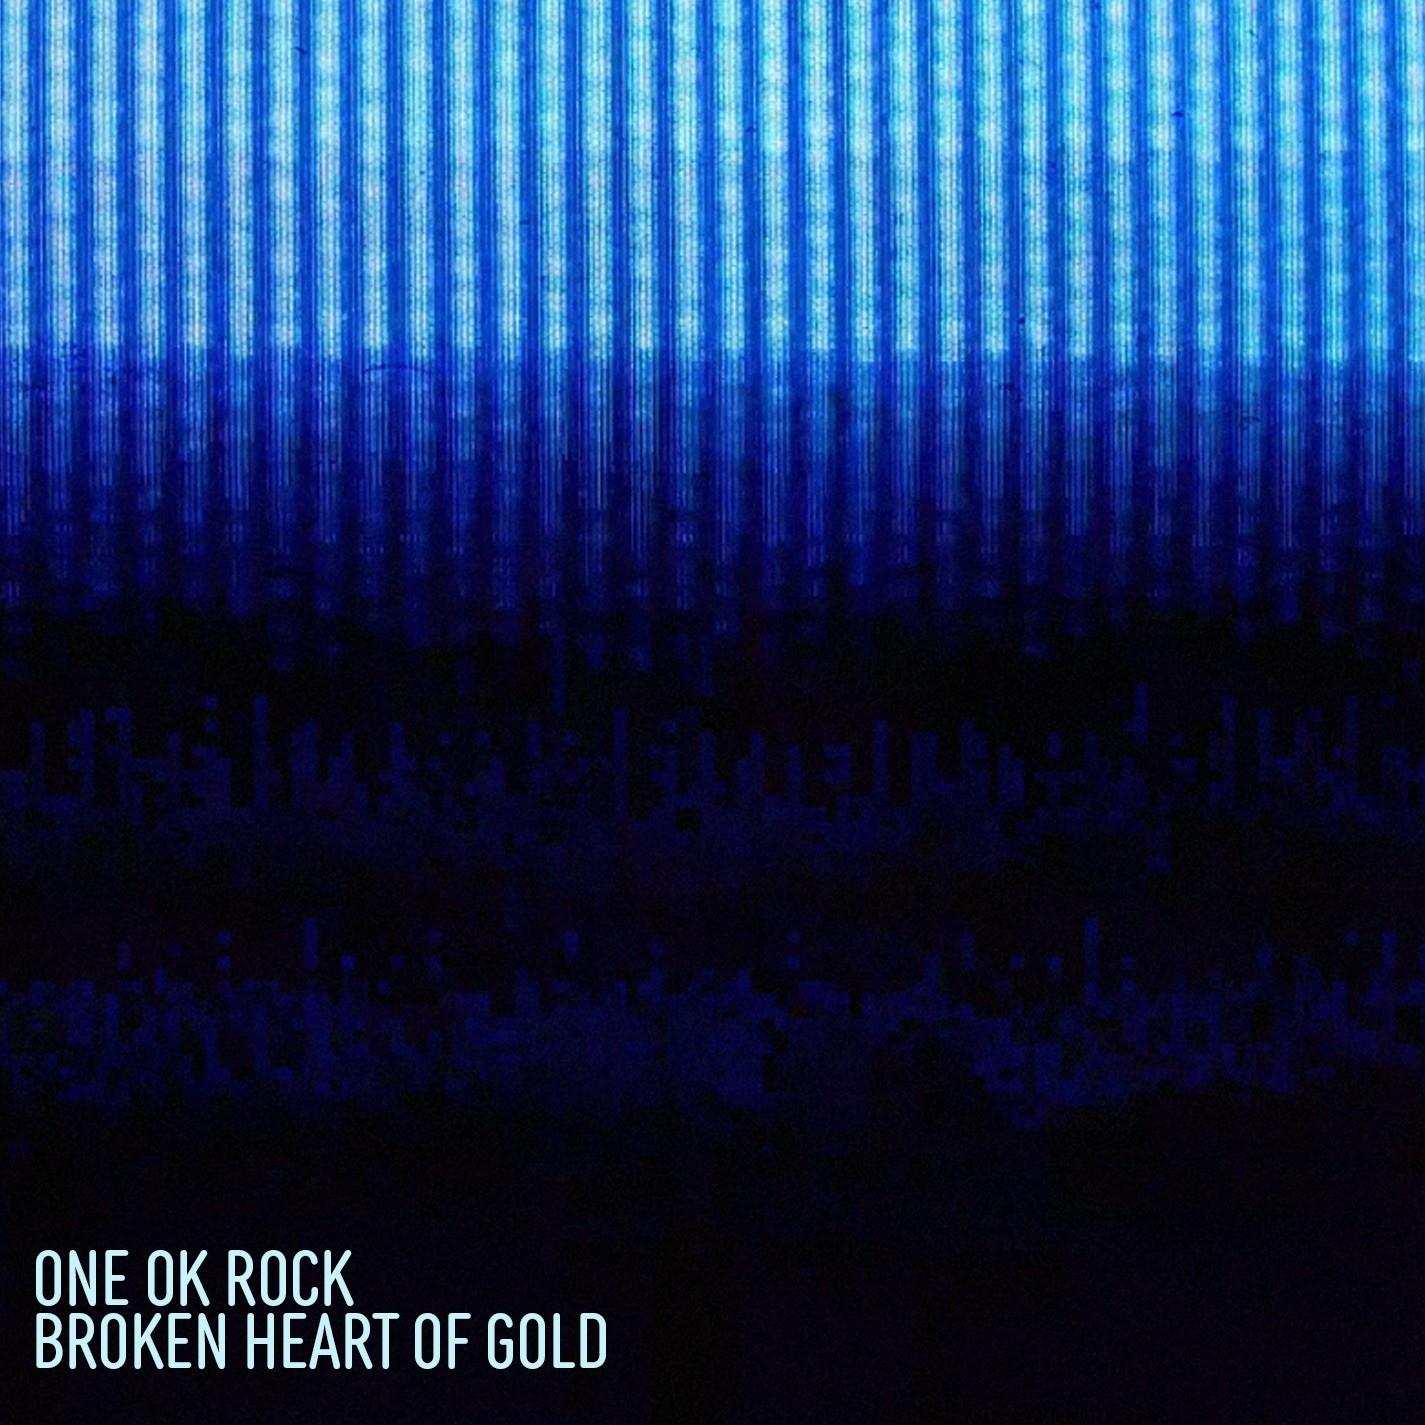 ONE OK ROCK – Broken Heart of Gold [24bit Lossless + MP3 320 / WEB] [2021.05.28]